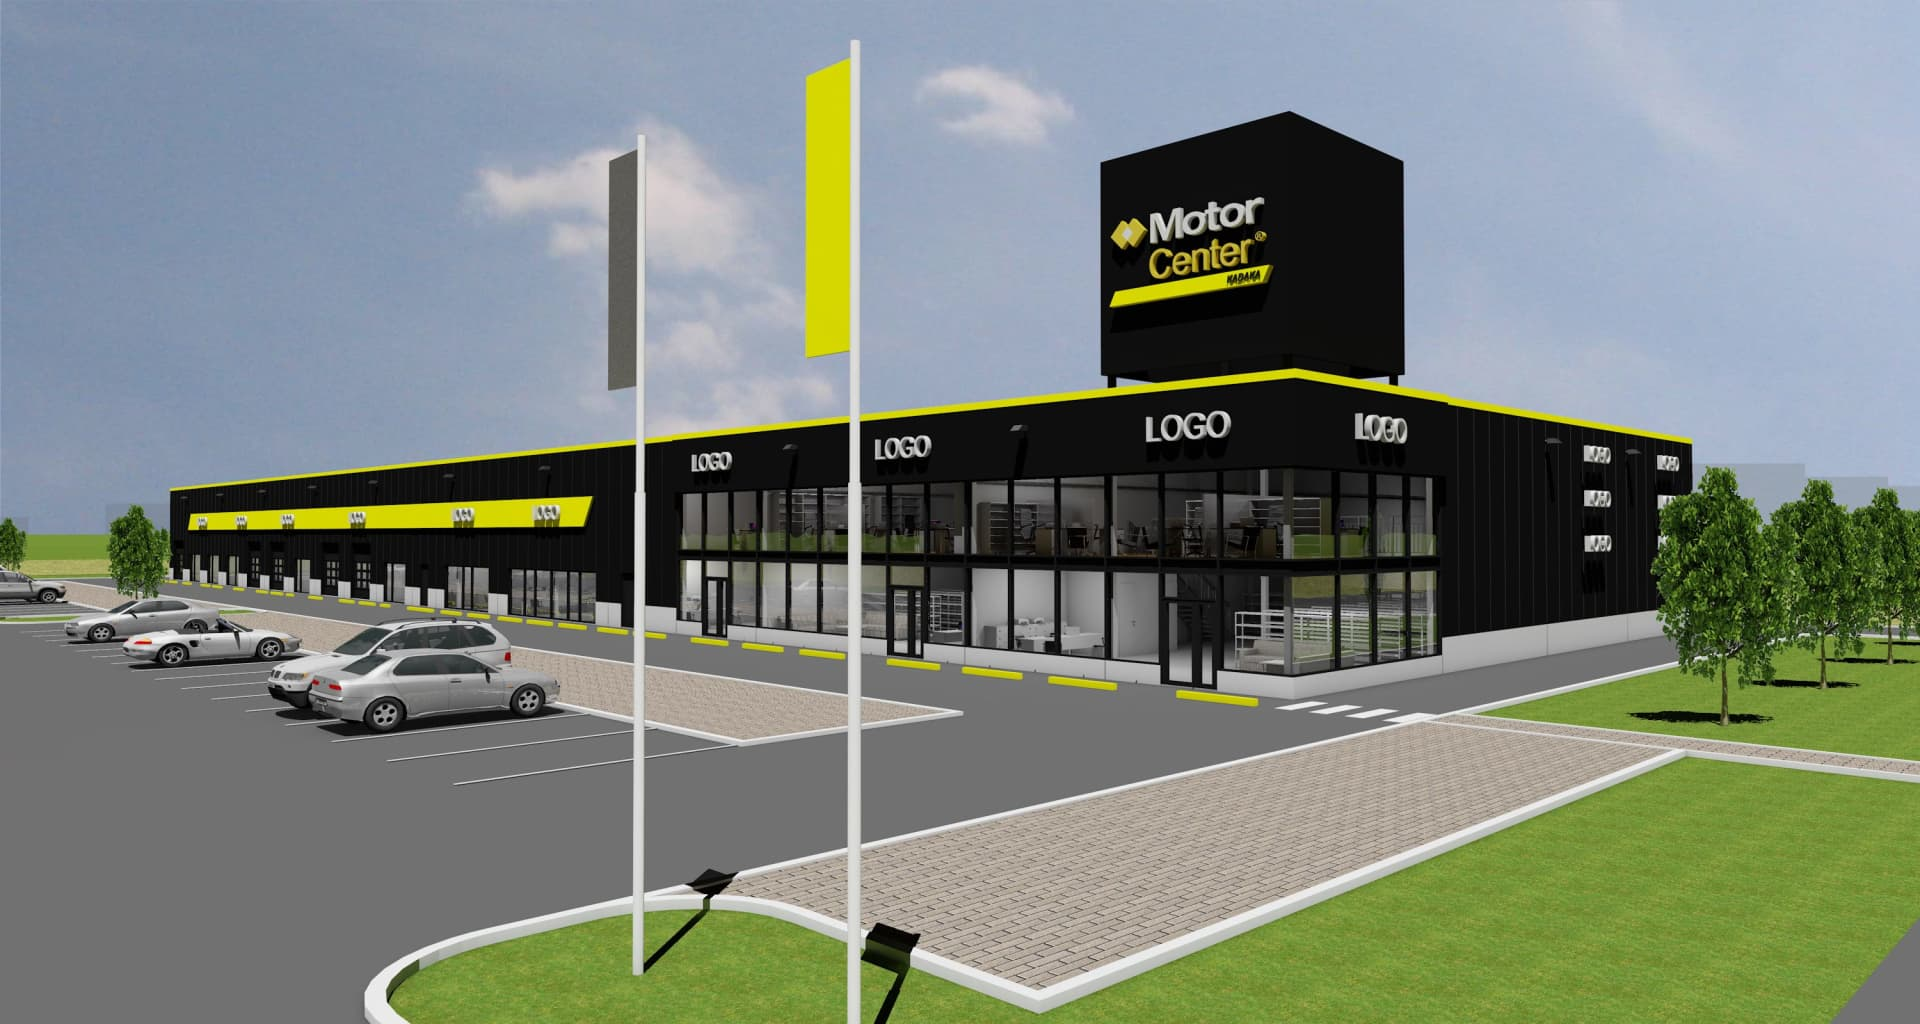 MotorCenter Kadaka 3D